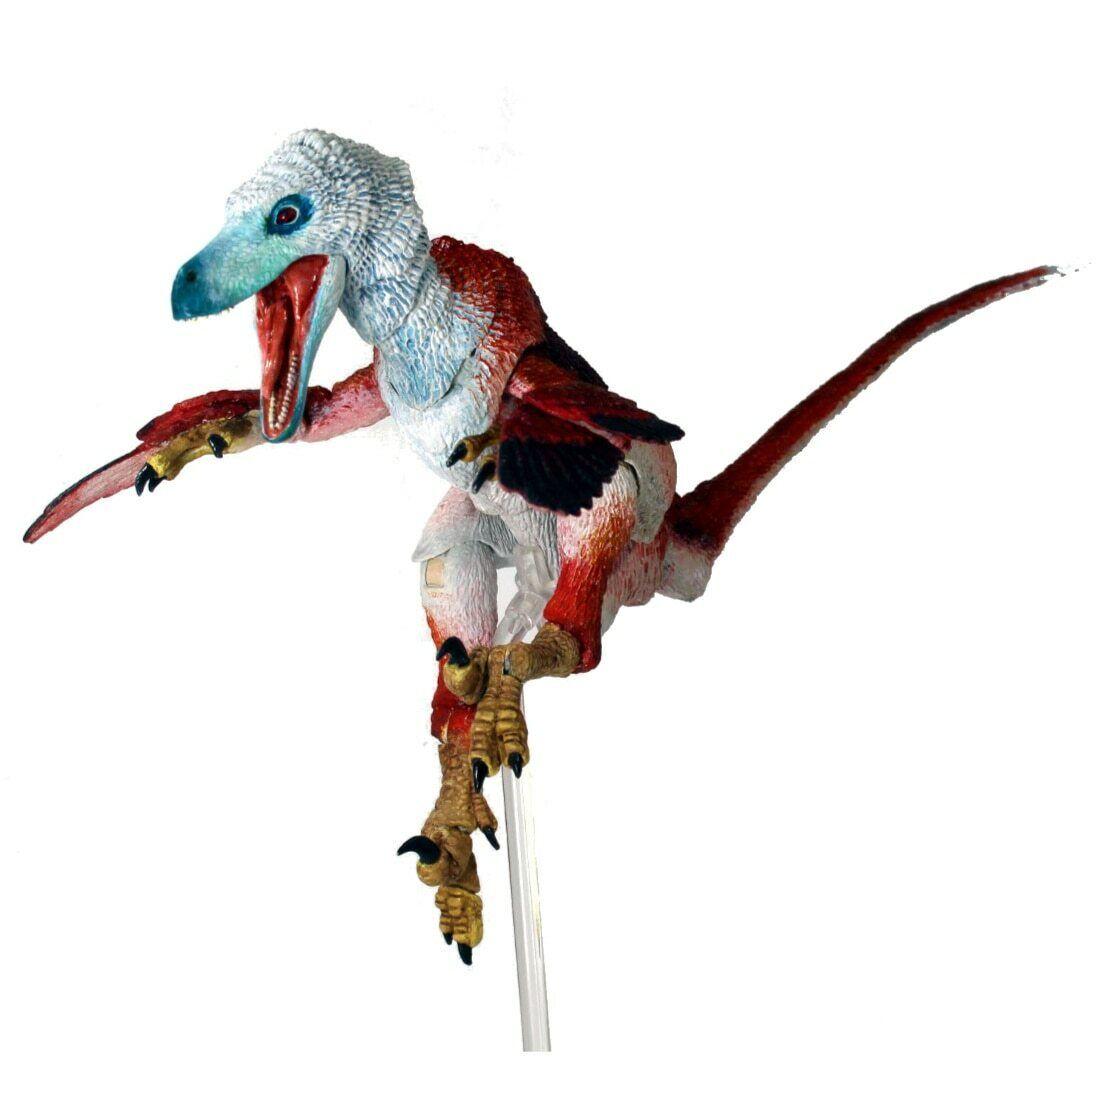 Beasts of the Mesozoic Velociraptor Osmolskae Alpha Exclusive 1 6 Scale Figurine